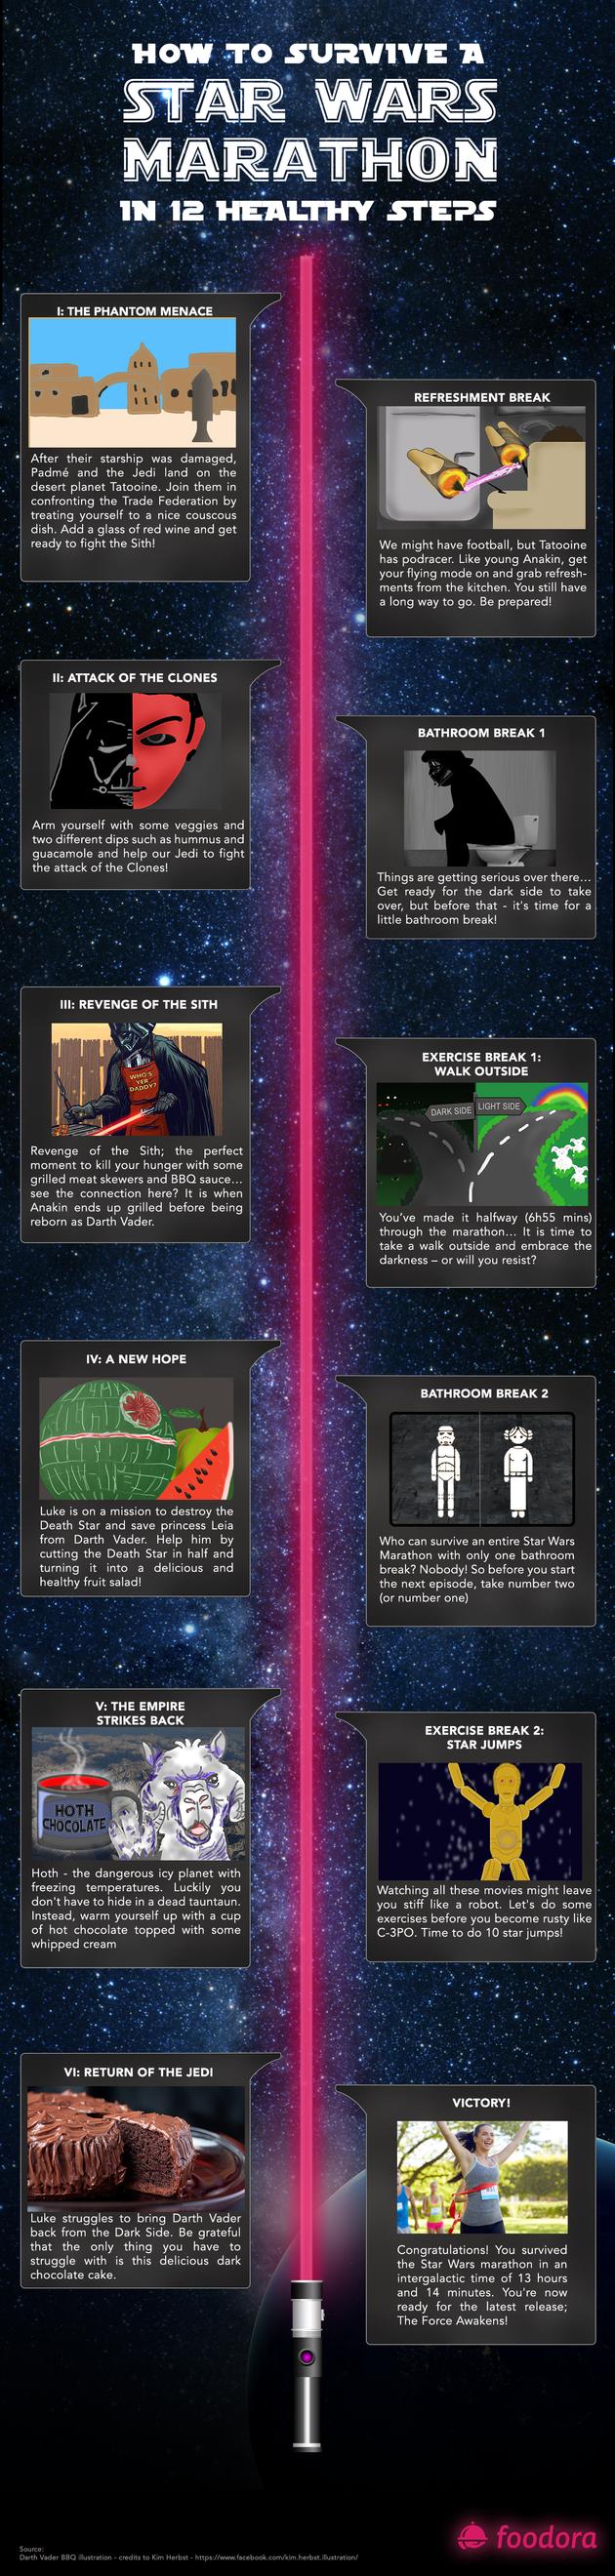 Foodora_Star_Wars_Timeline